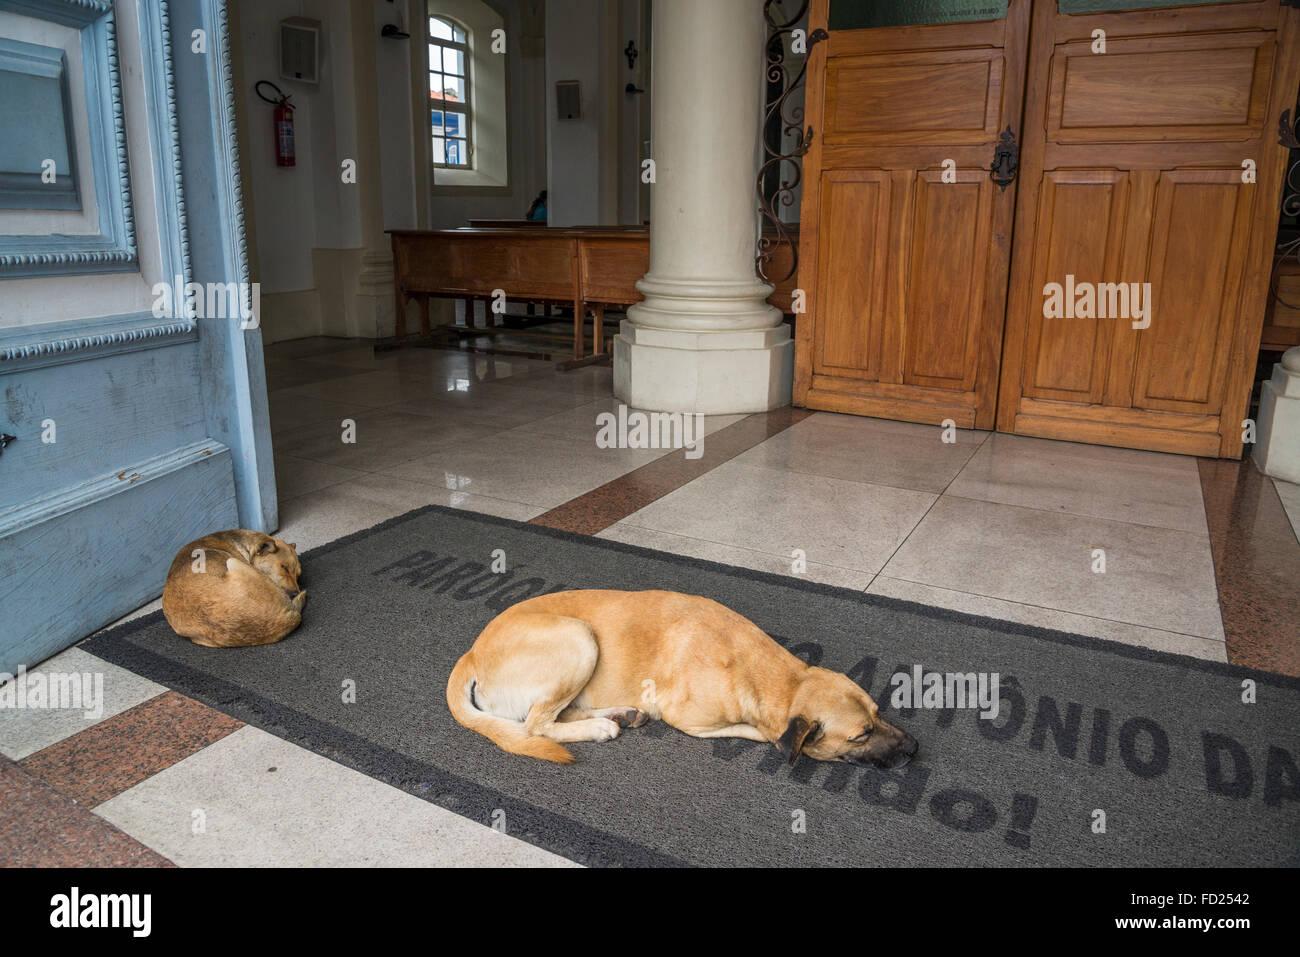 Dogs sleeping in front of Catedral Metropolitana, Santo Antonio Cathedral, Diamantina, Minas Gerais, Brazil - Stock Image